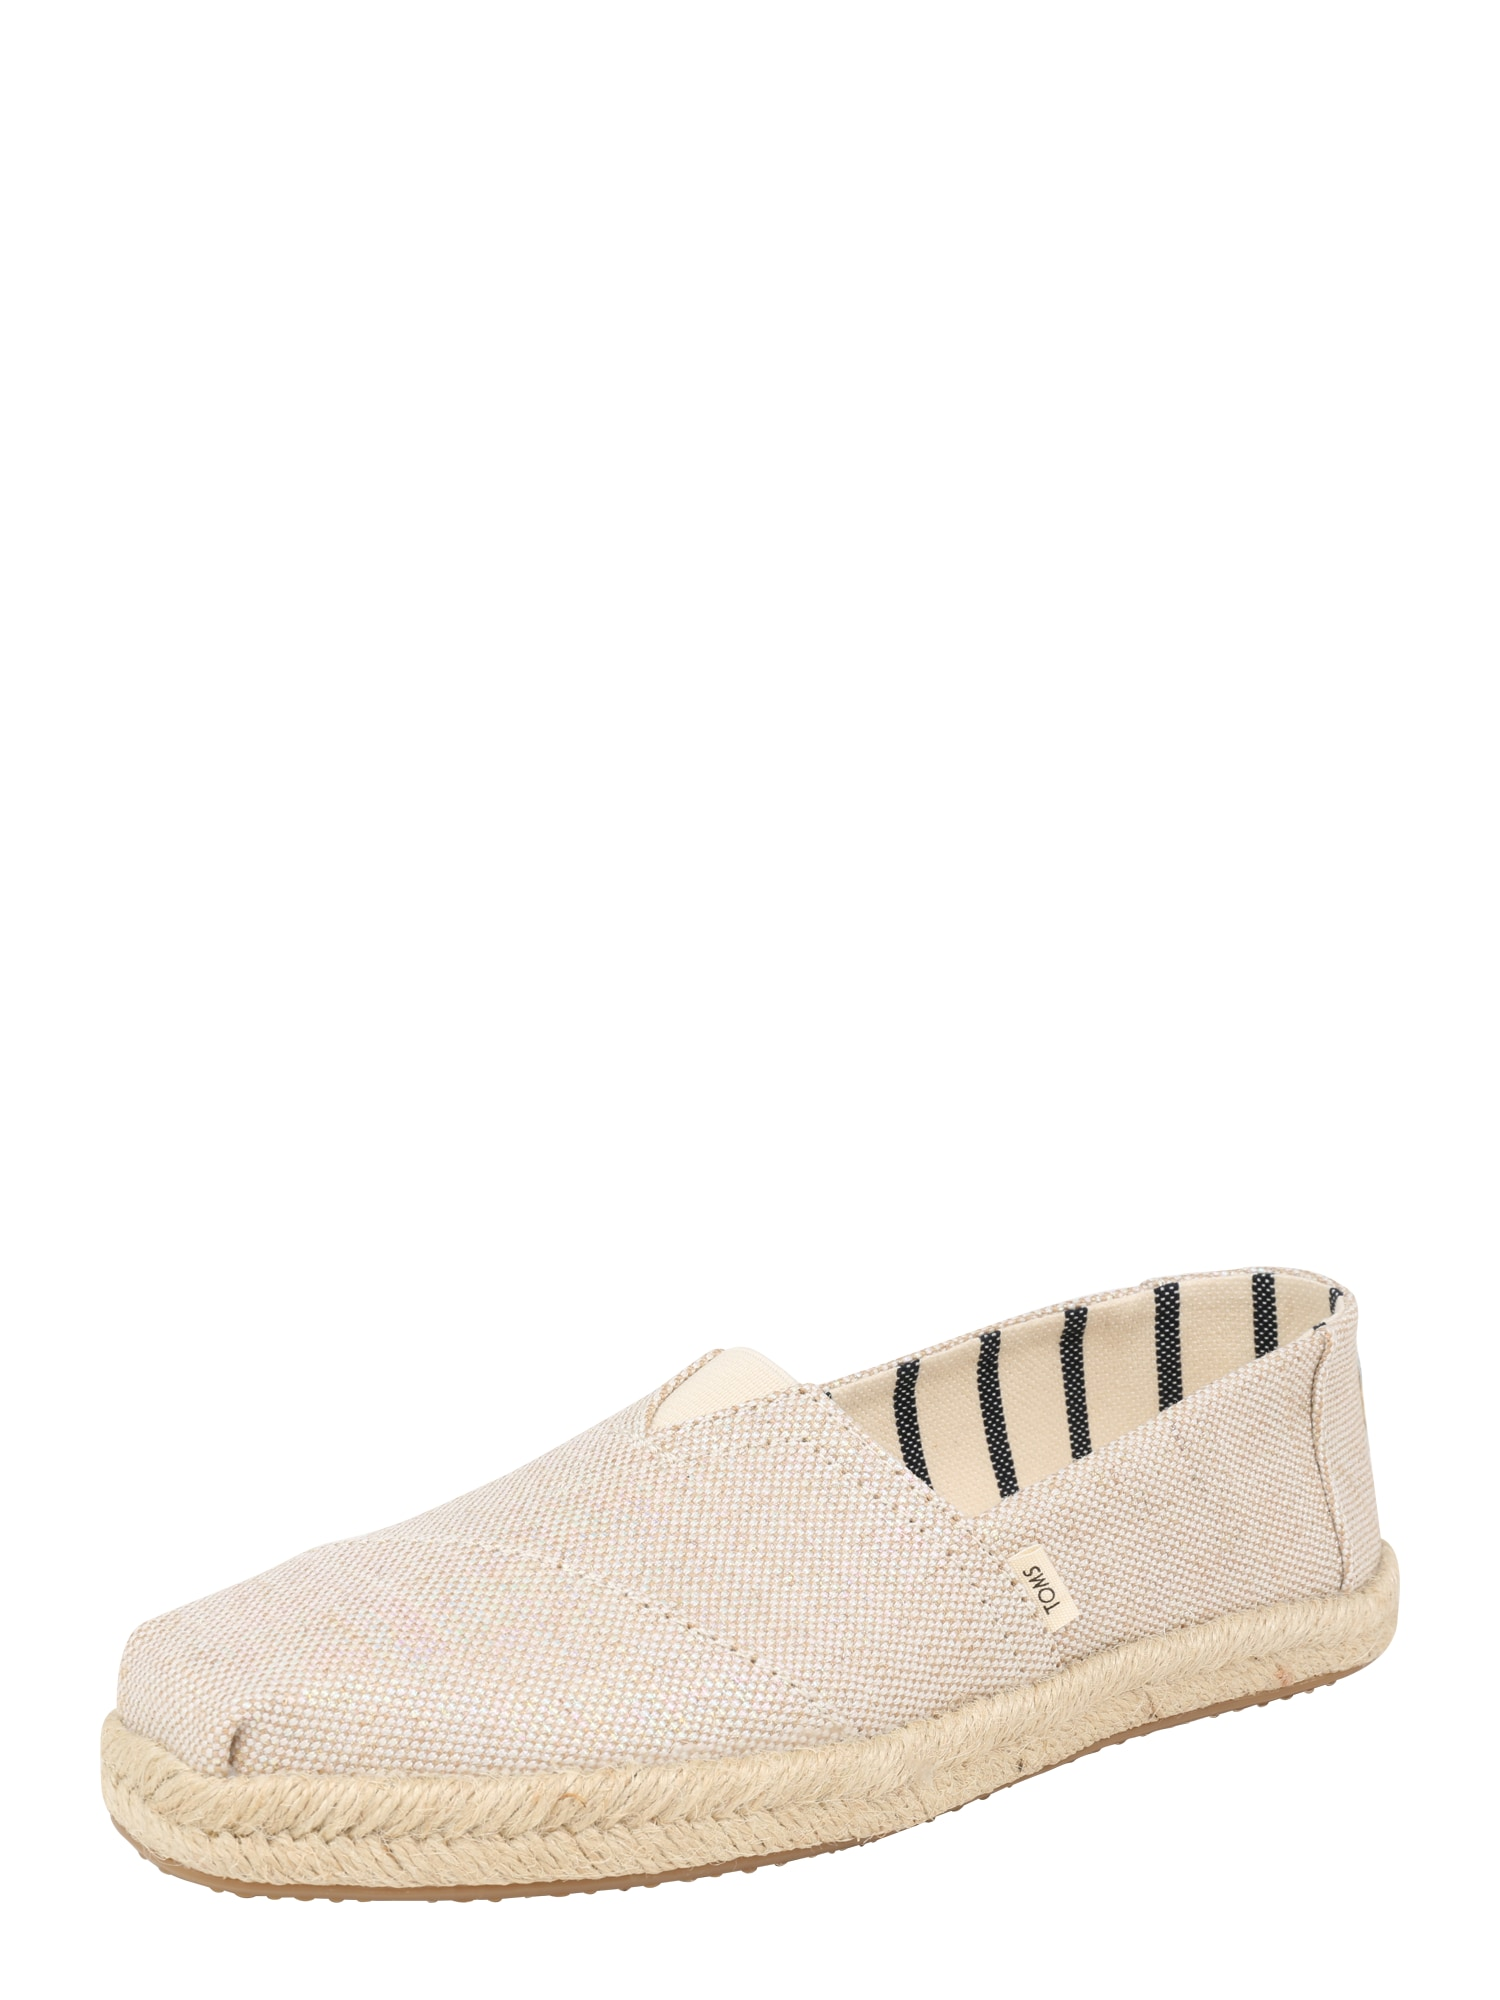 Espadrilles 'Alpargata Core' | Schuhe > Espadrilles | Beige | TOMS